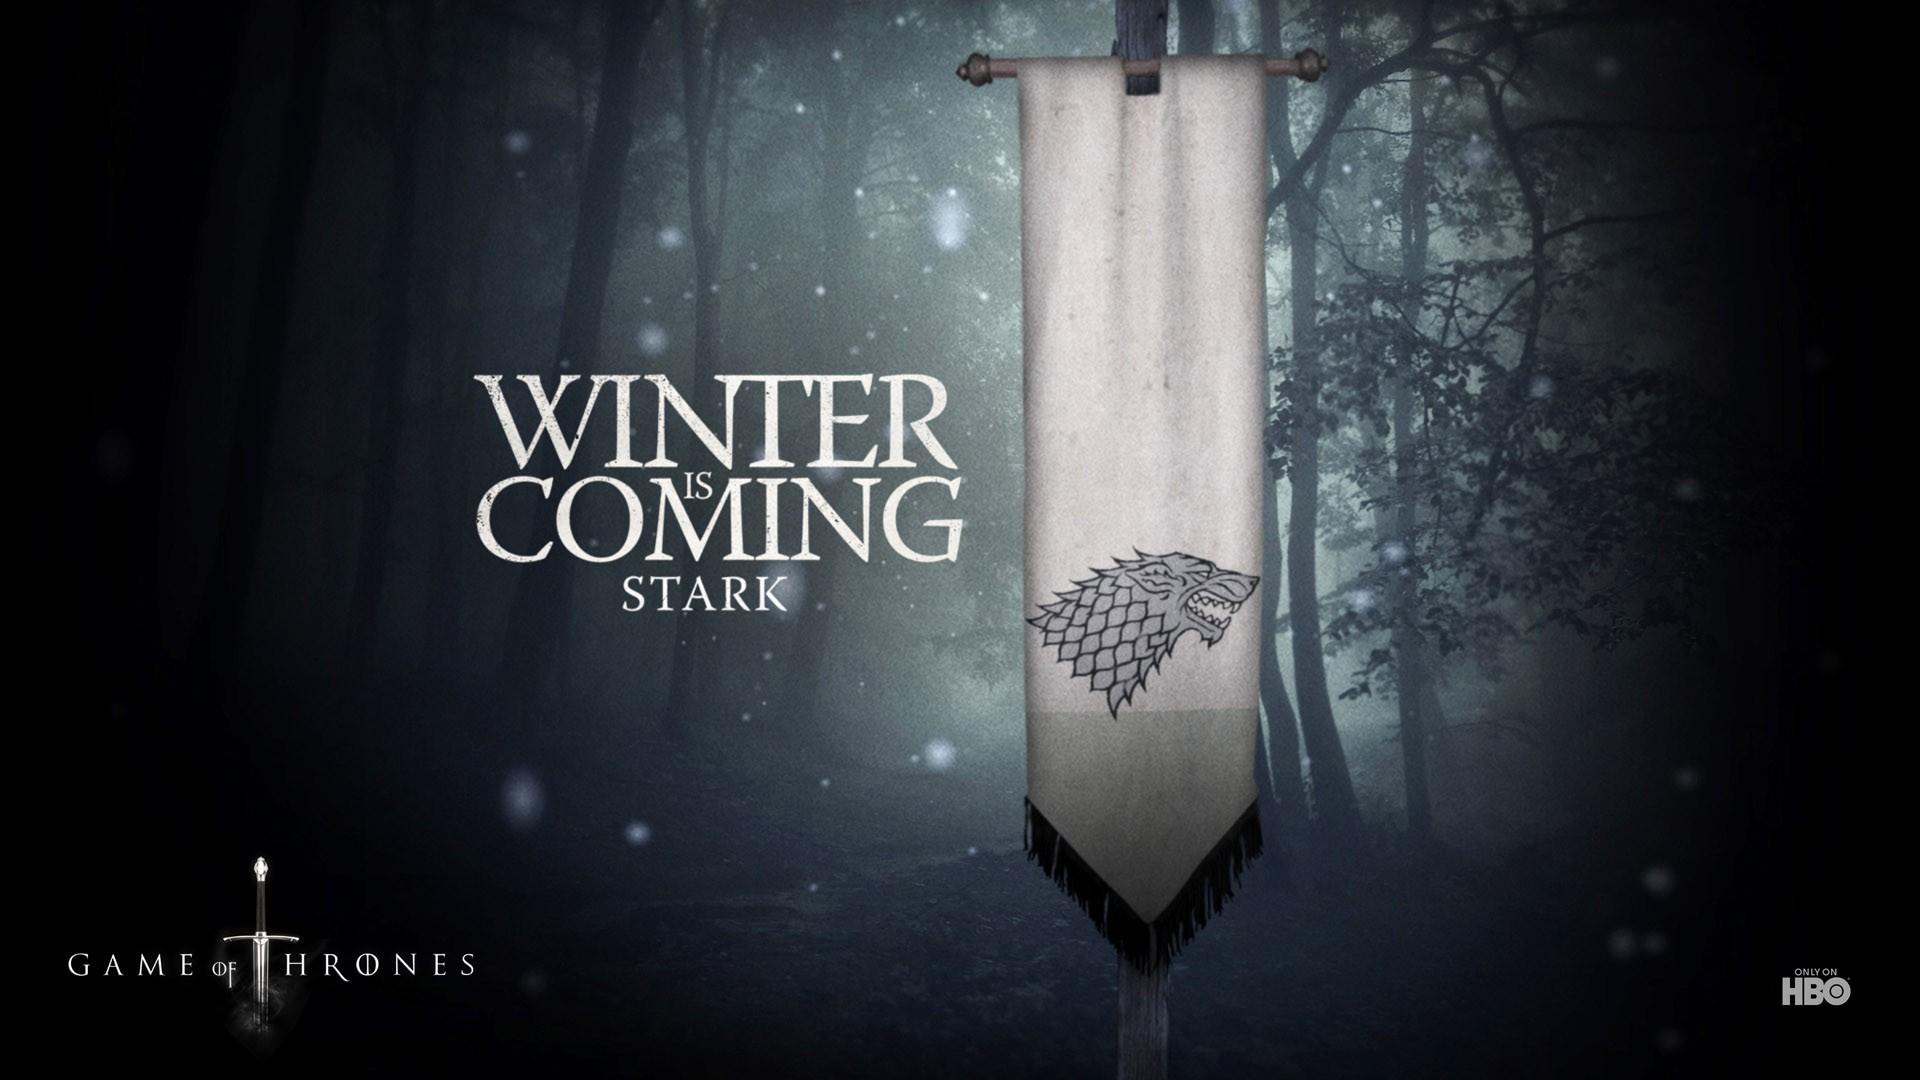 https://i1.wp.com/neuronafinanciera.com/wp-content/uploads/2013/05/winter_is_coming_w1.jpeg